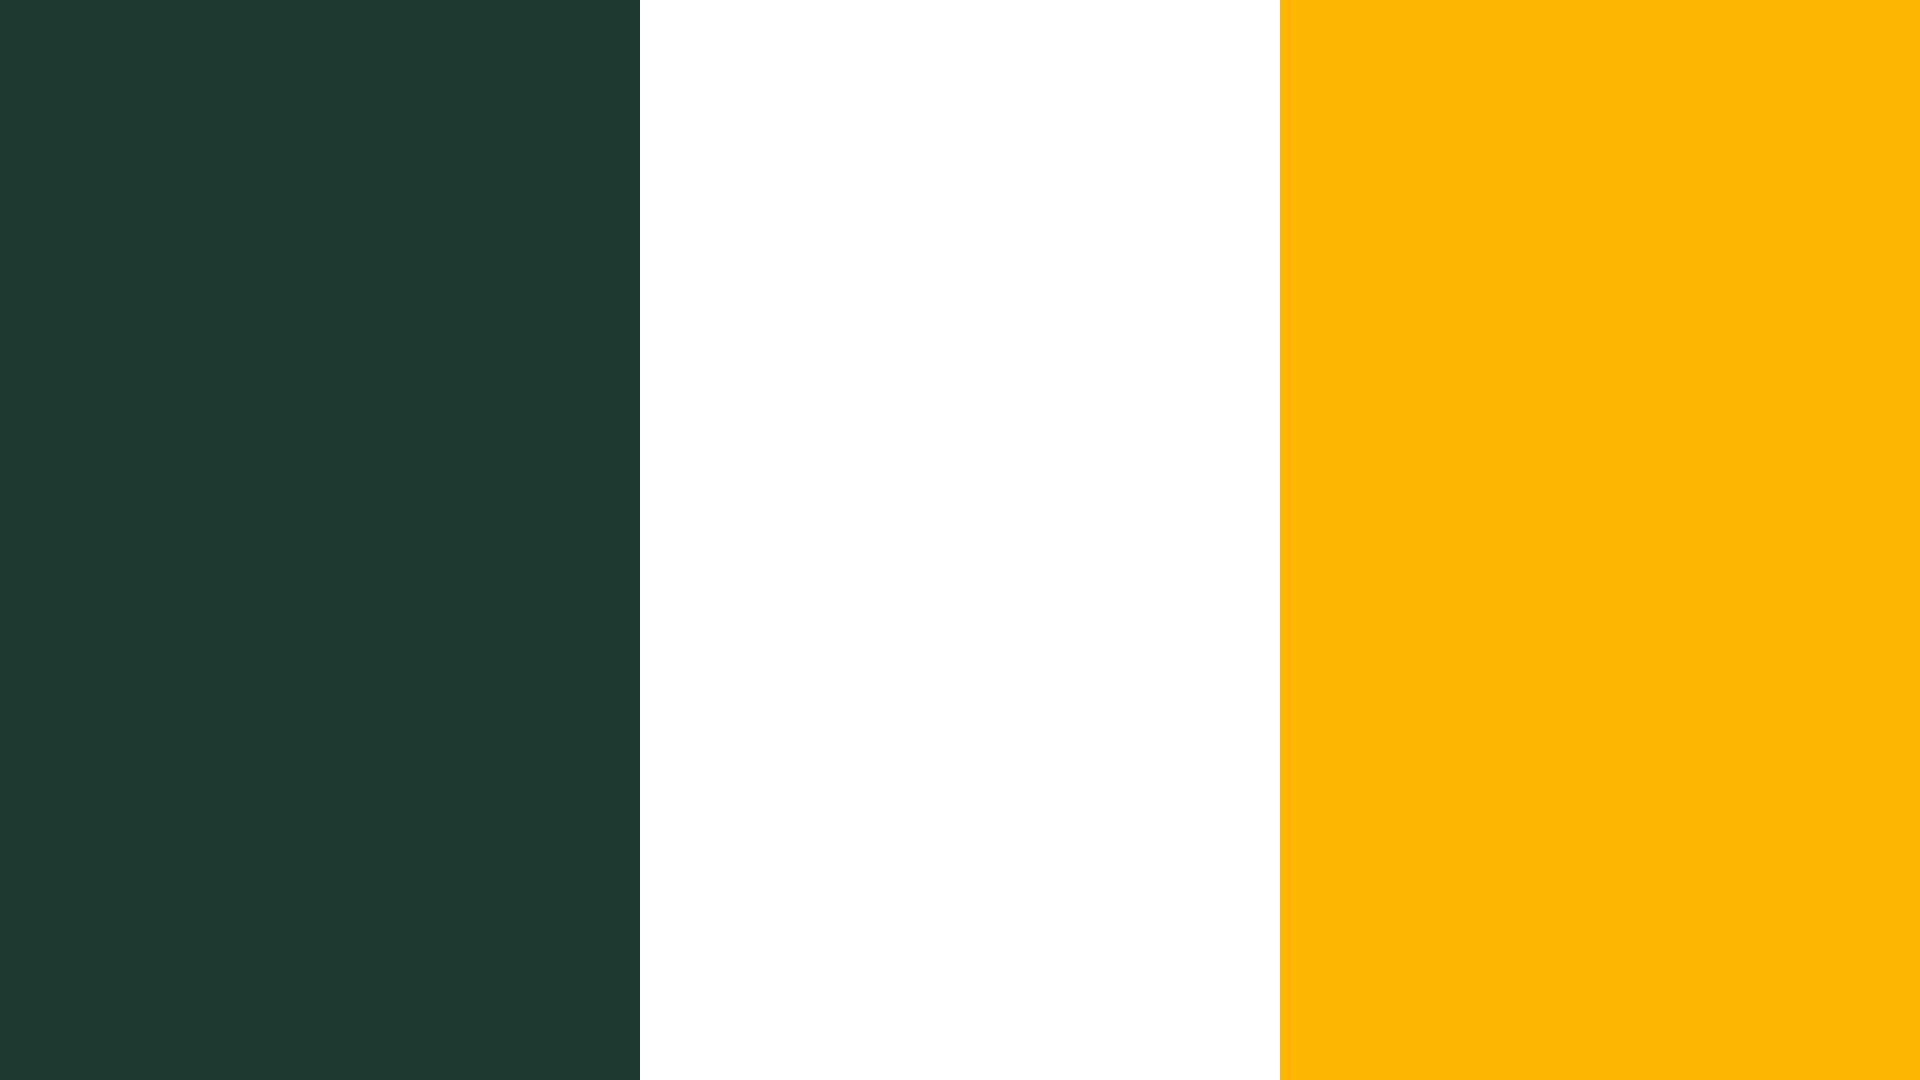 Green Bay Packers Logo Color Scheme Brand And Logo Schemecolor Com